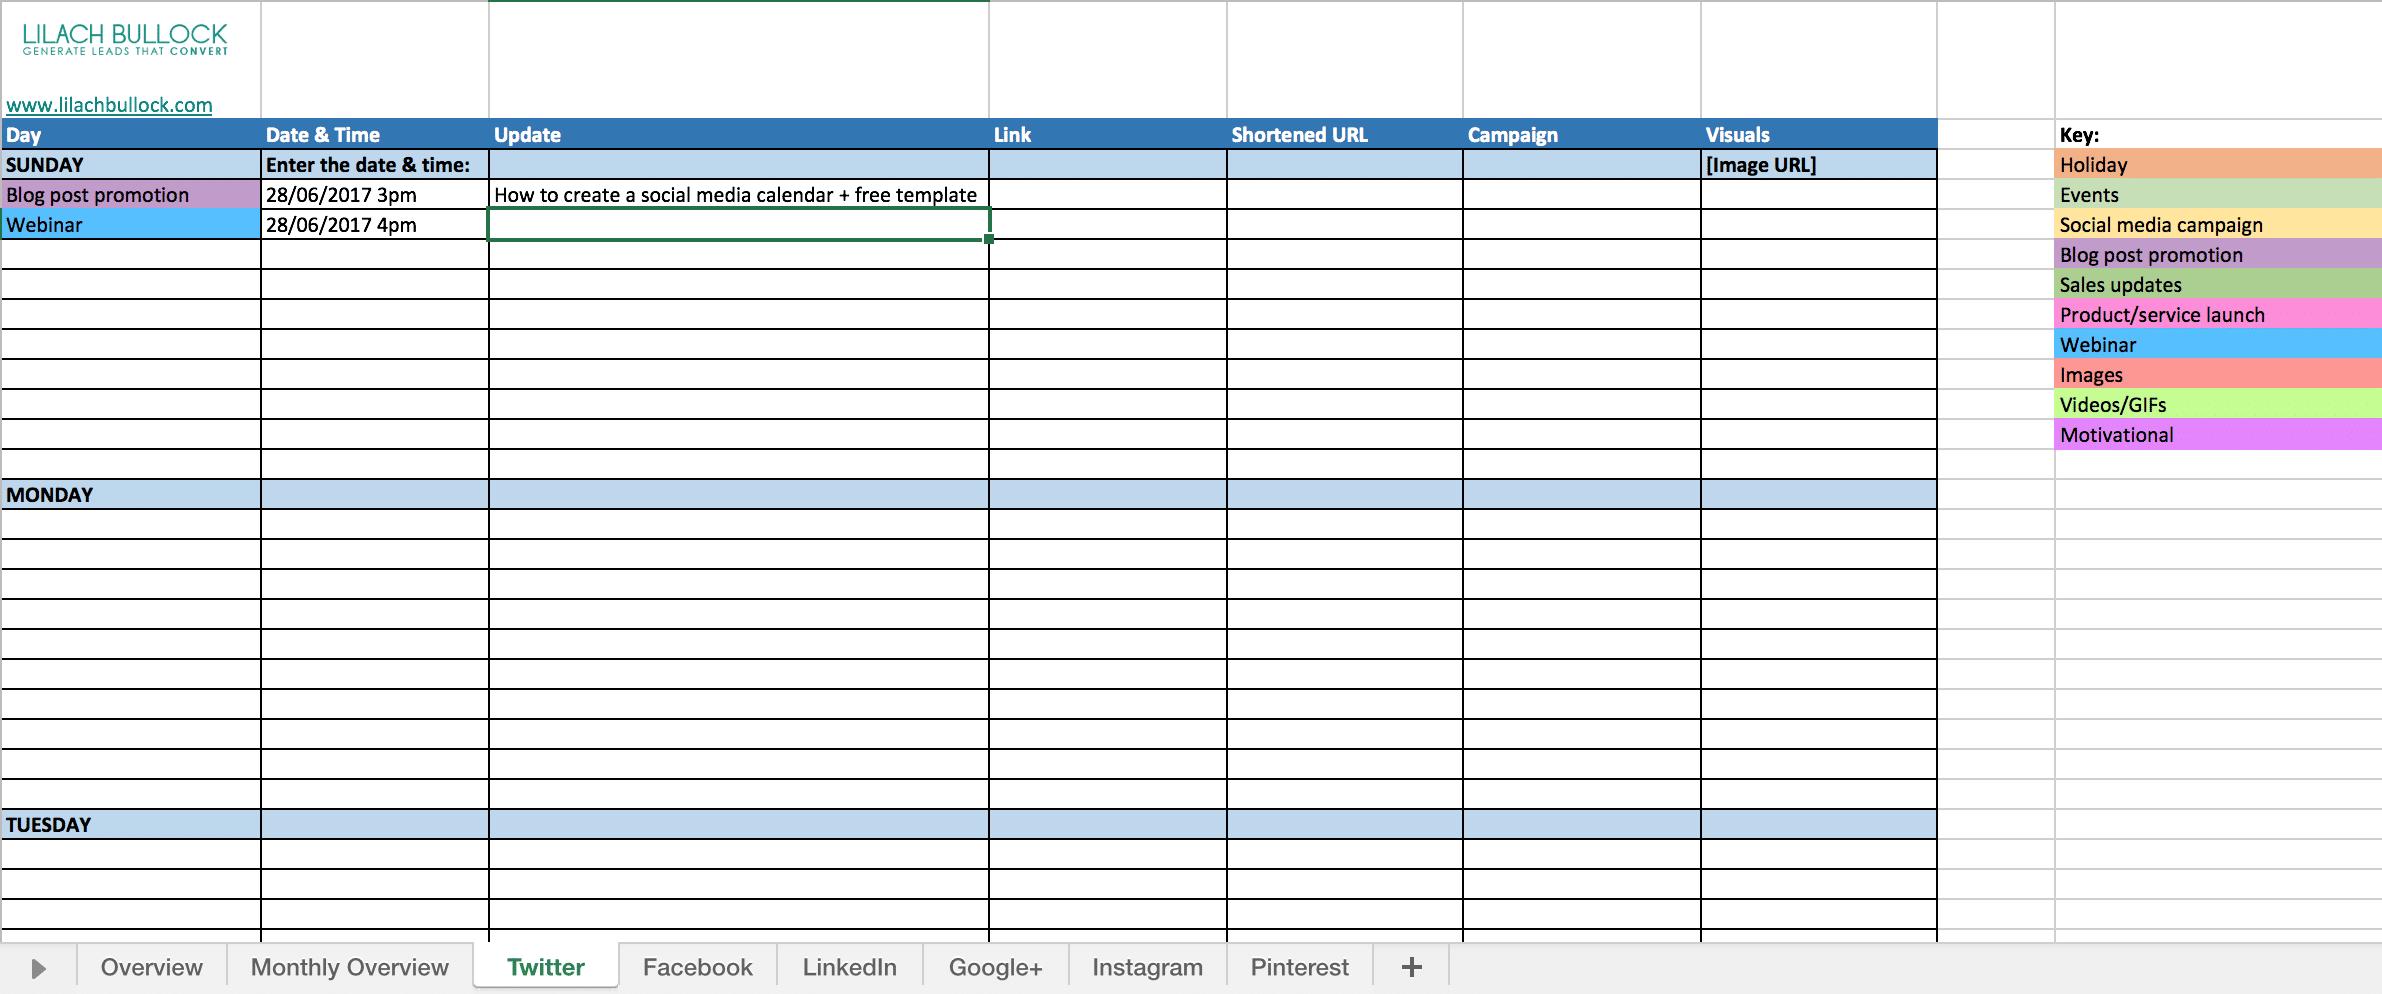 How To Create A Social Media Calendar Free Template